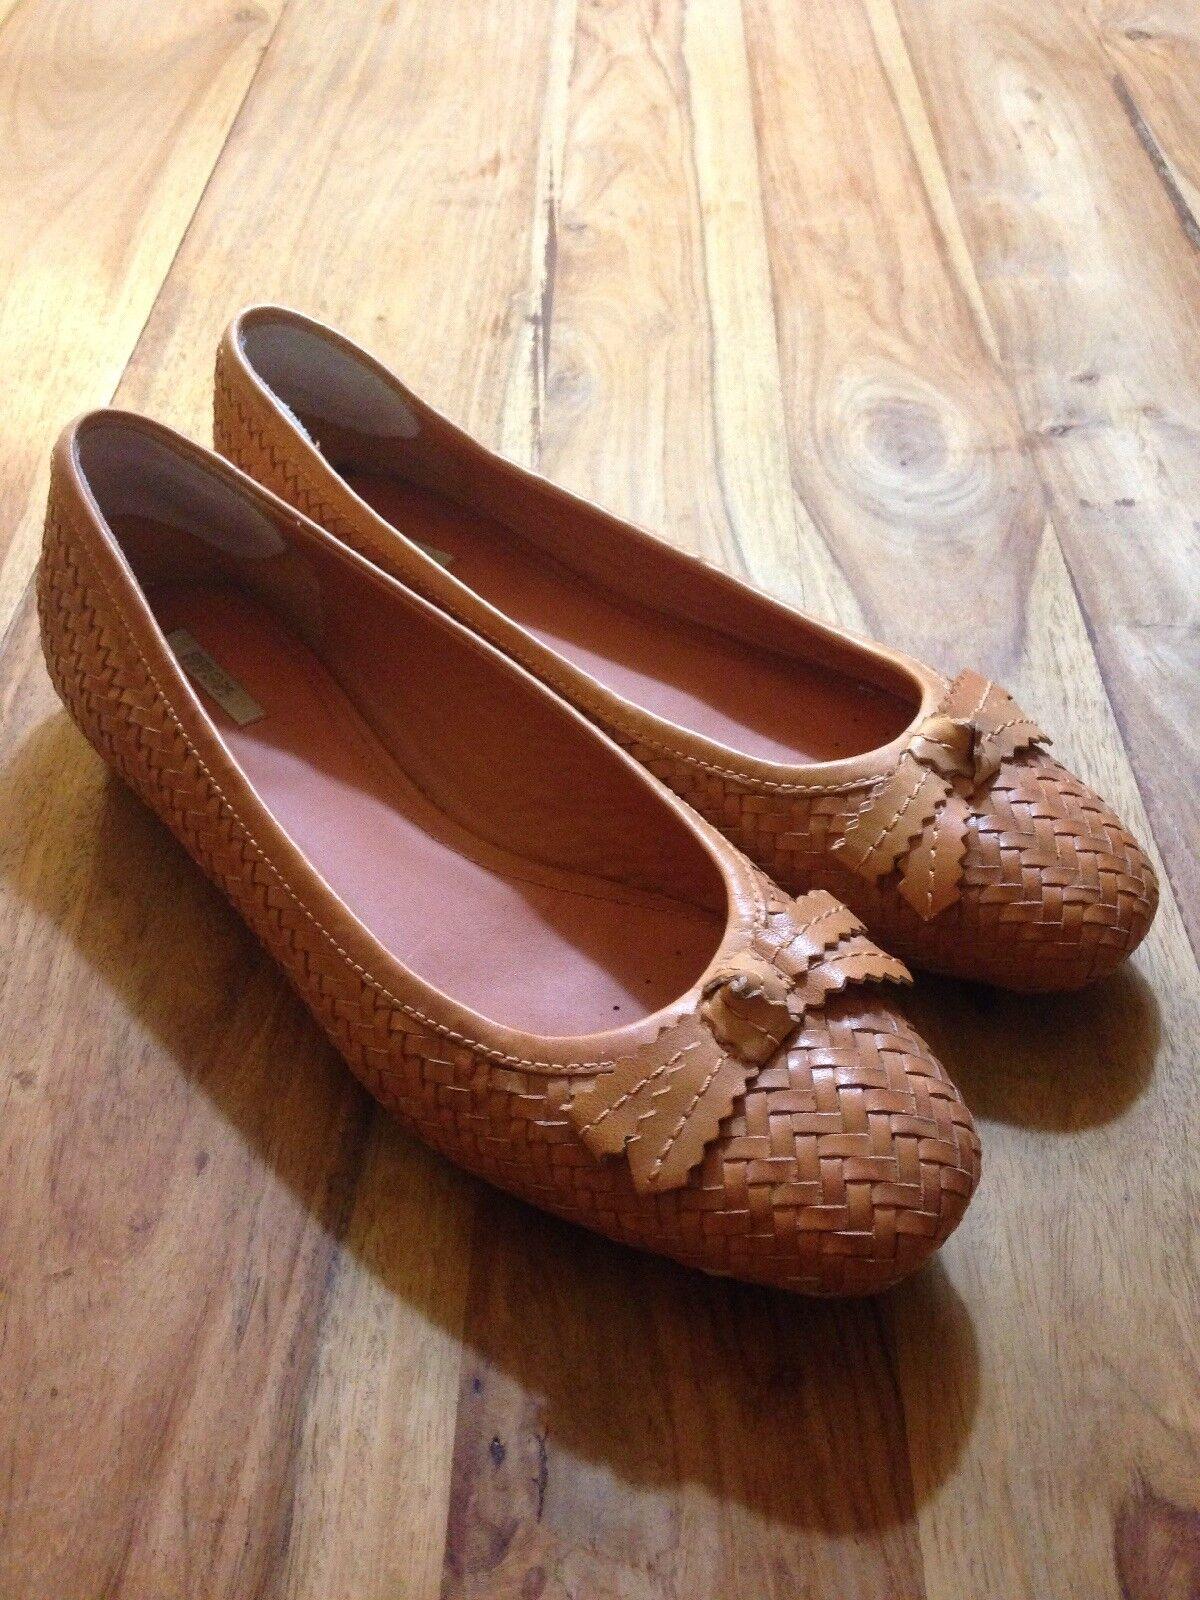 Tolle Damen Schuhe Schuhe Damen Ballerina 41 GEOX Cognac geflochten bf9cc0